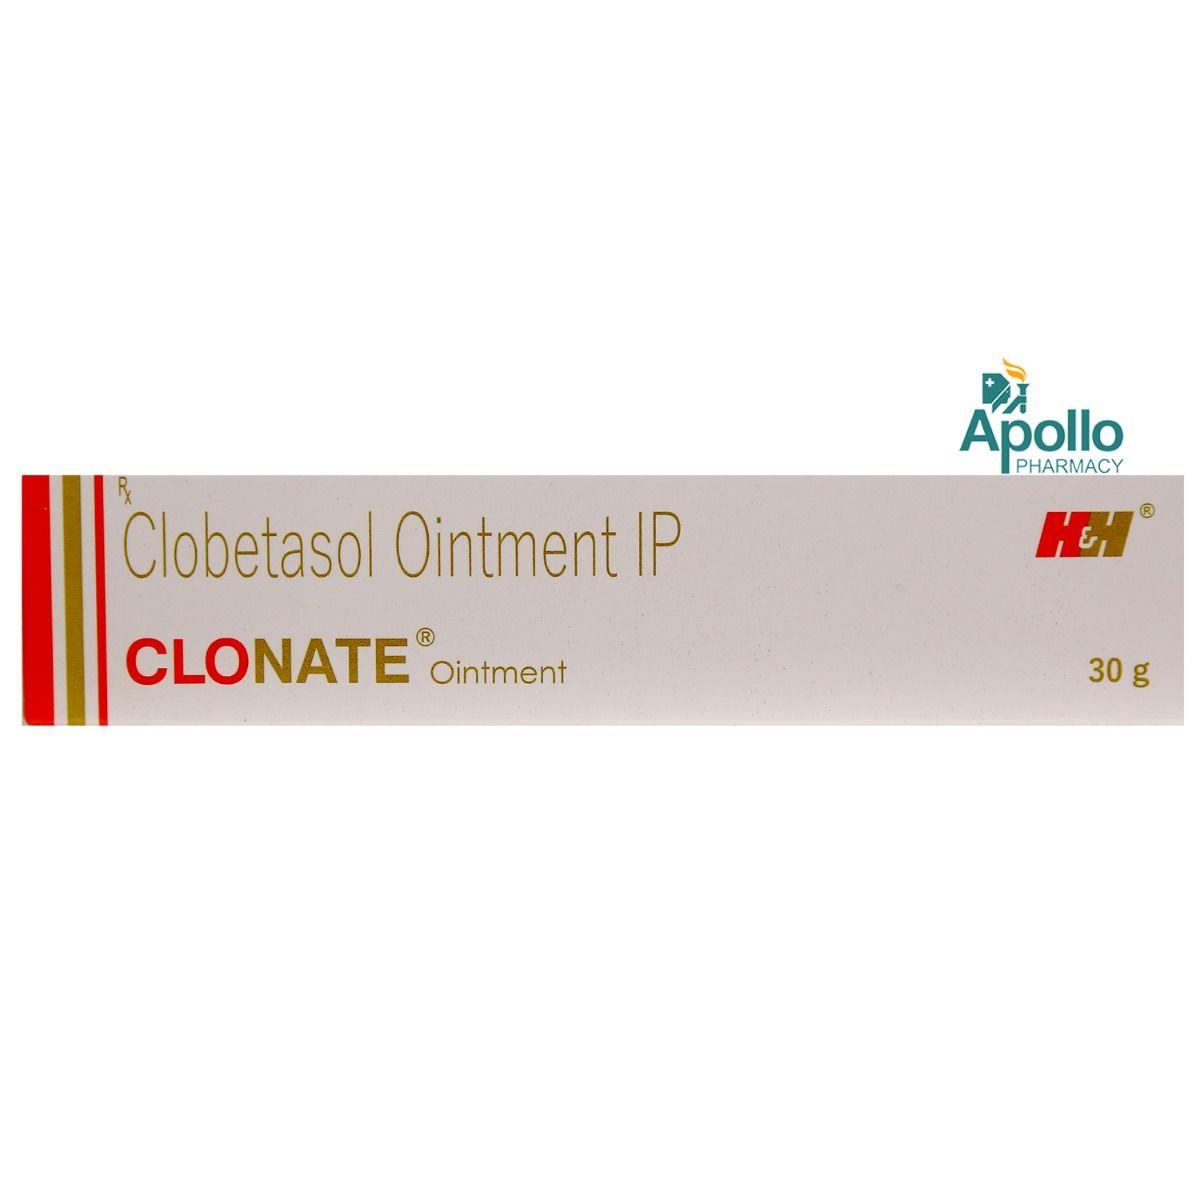 Clonate Ointment 30 gm